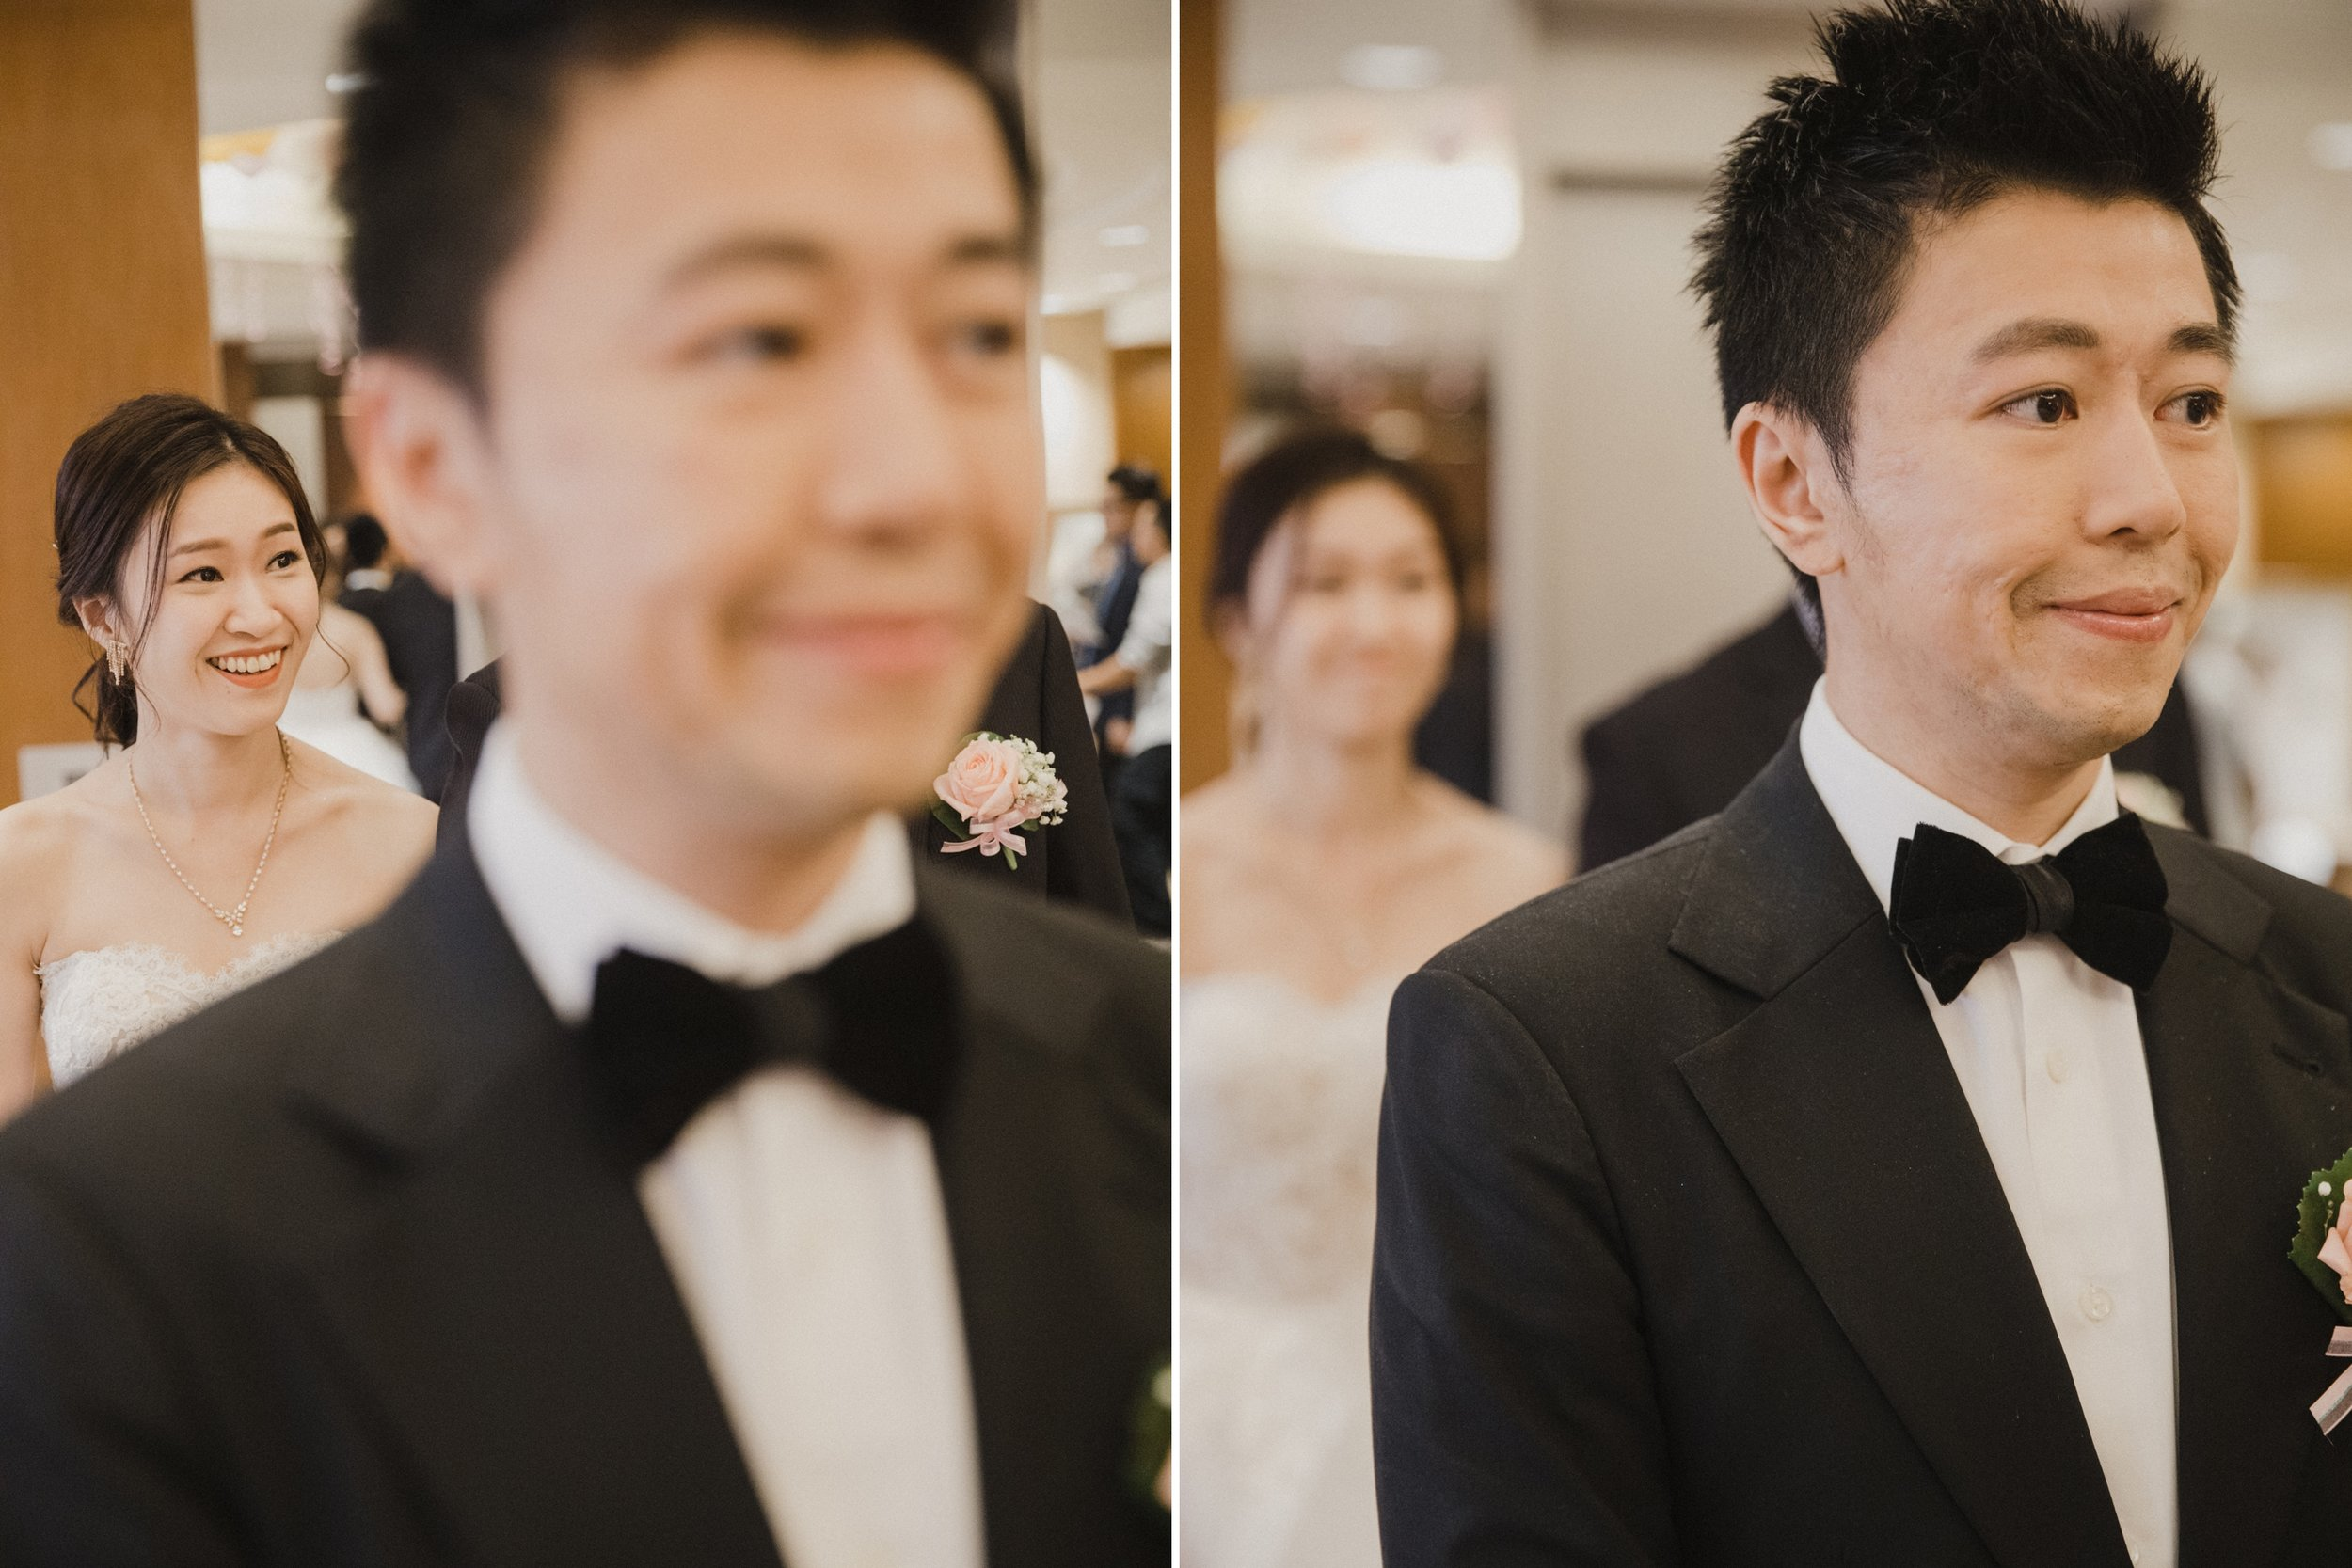 wedding-caridee-oscar-lunch-ambassador-hsinchu-結婚午宴-新竹國賓_55.jpg